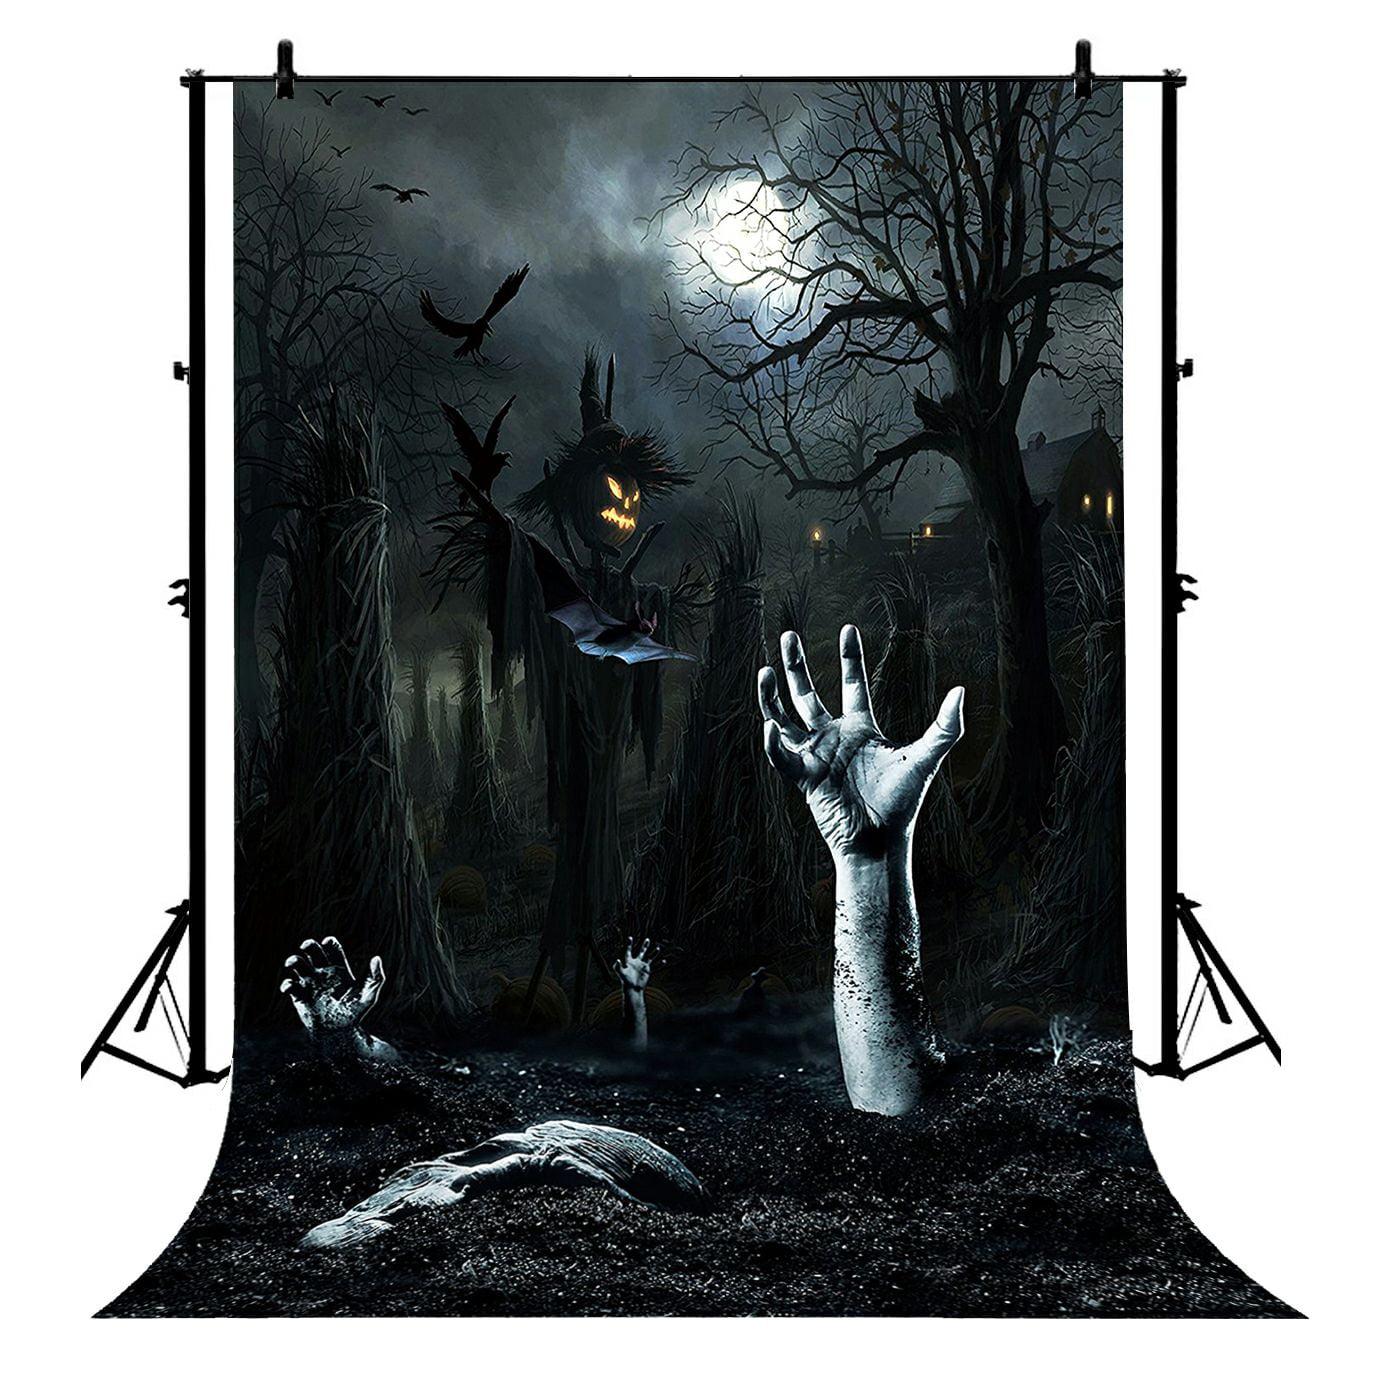 GCKG 7x5ft Halloween Horror Cemeterys Polyester Photography Backdrop Photo Background Studio Props - image 4 de 4